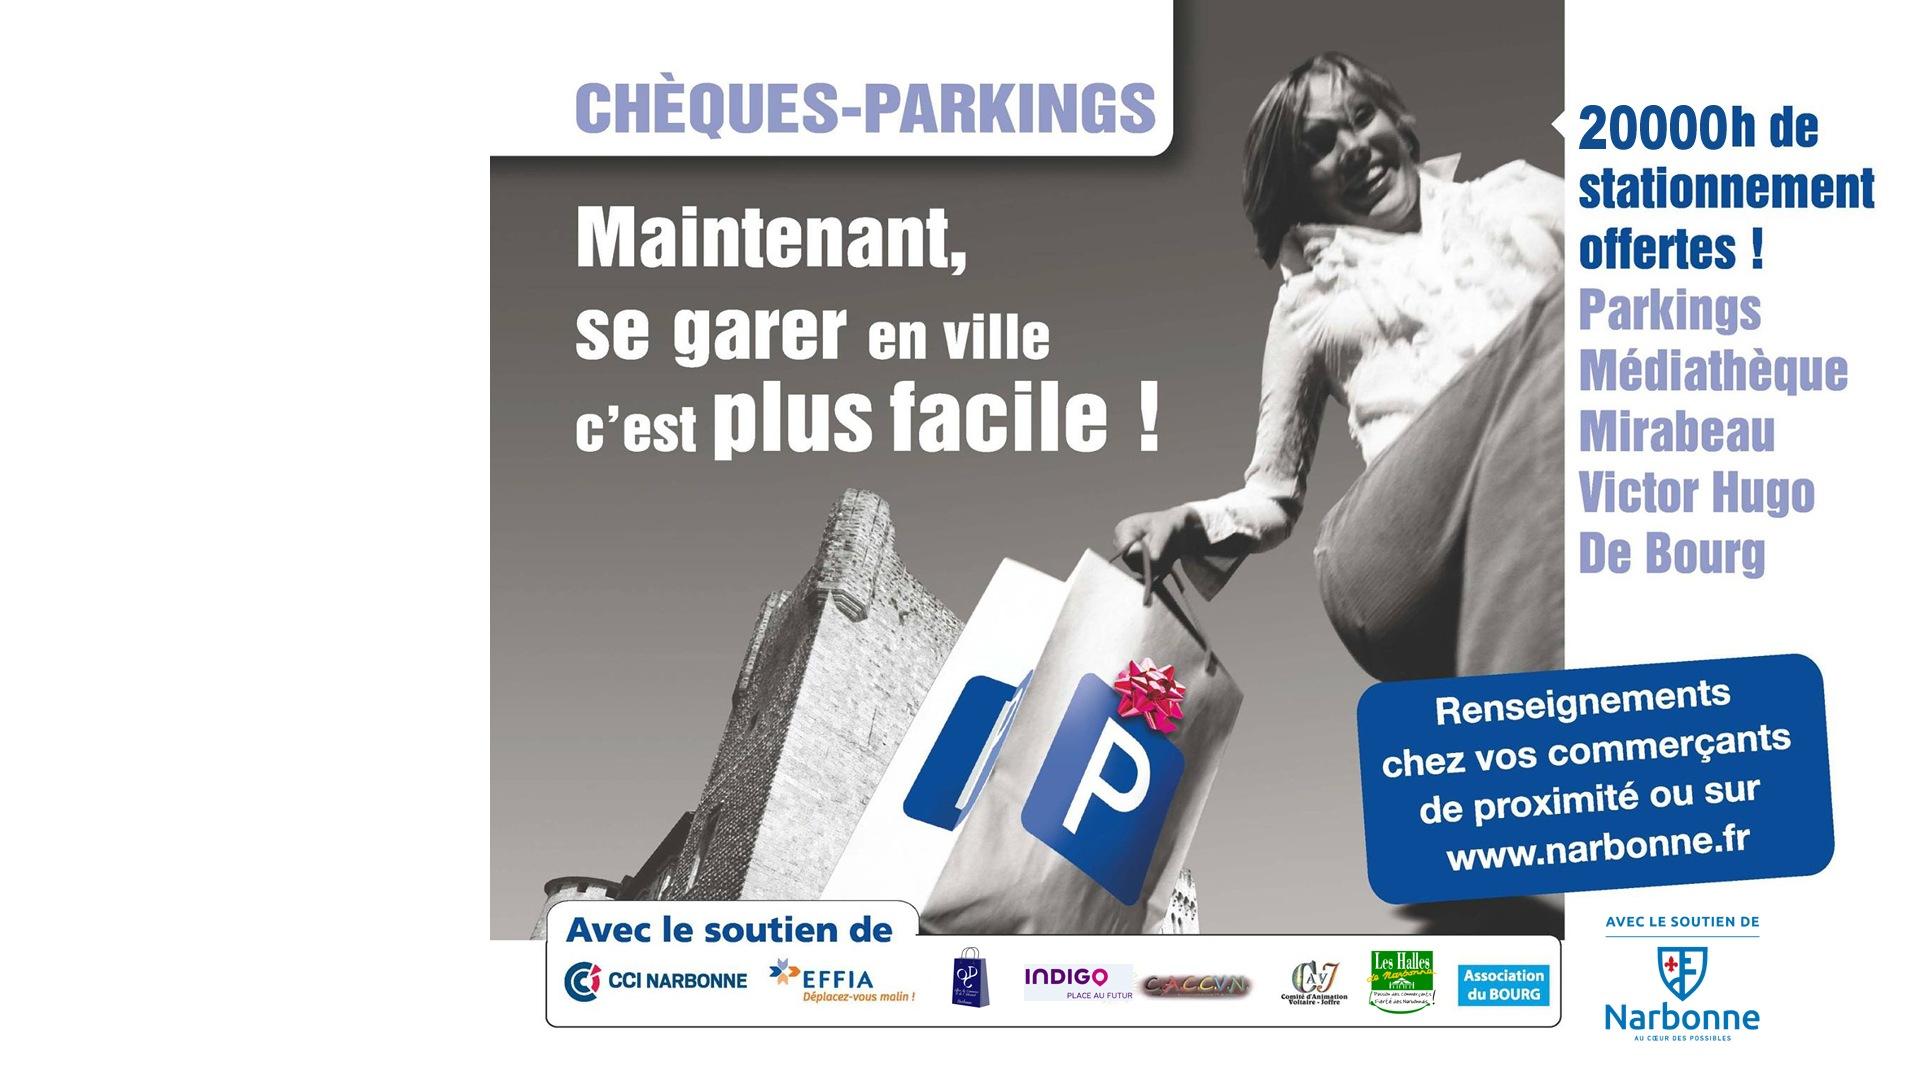 cheque_parkin_halles_narbonne